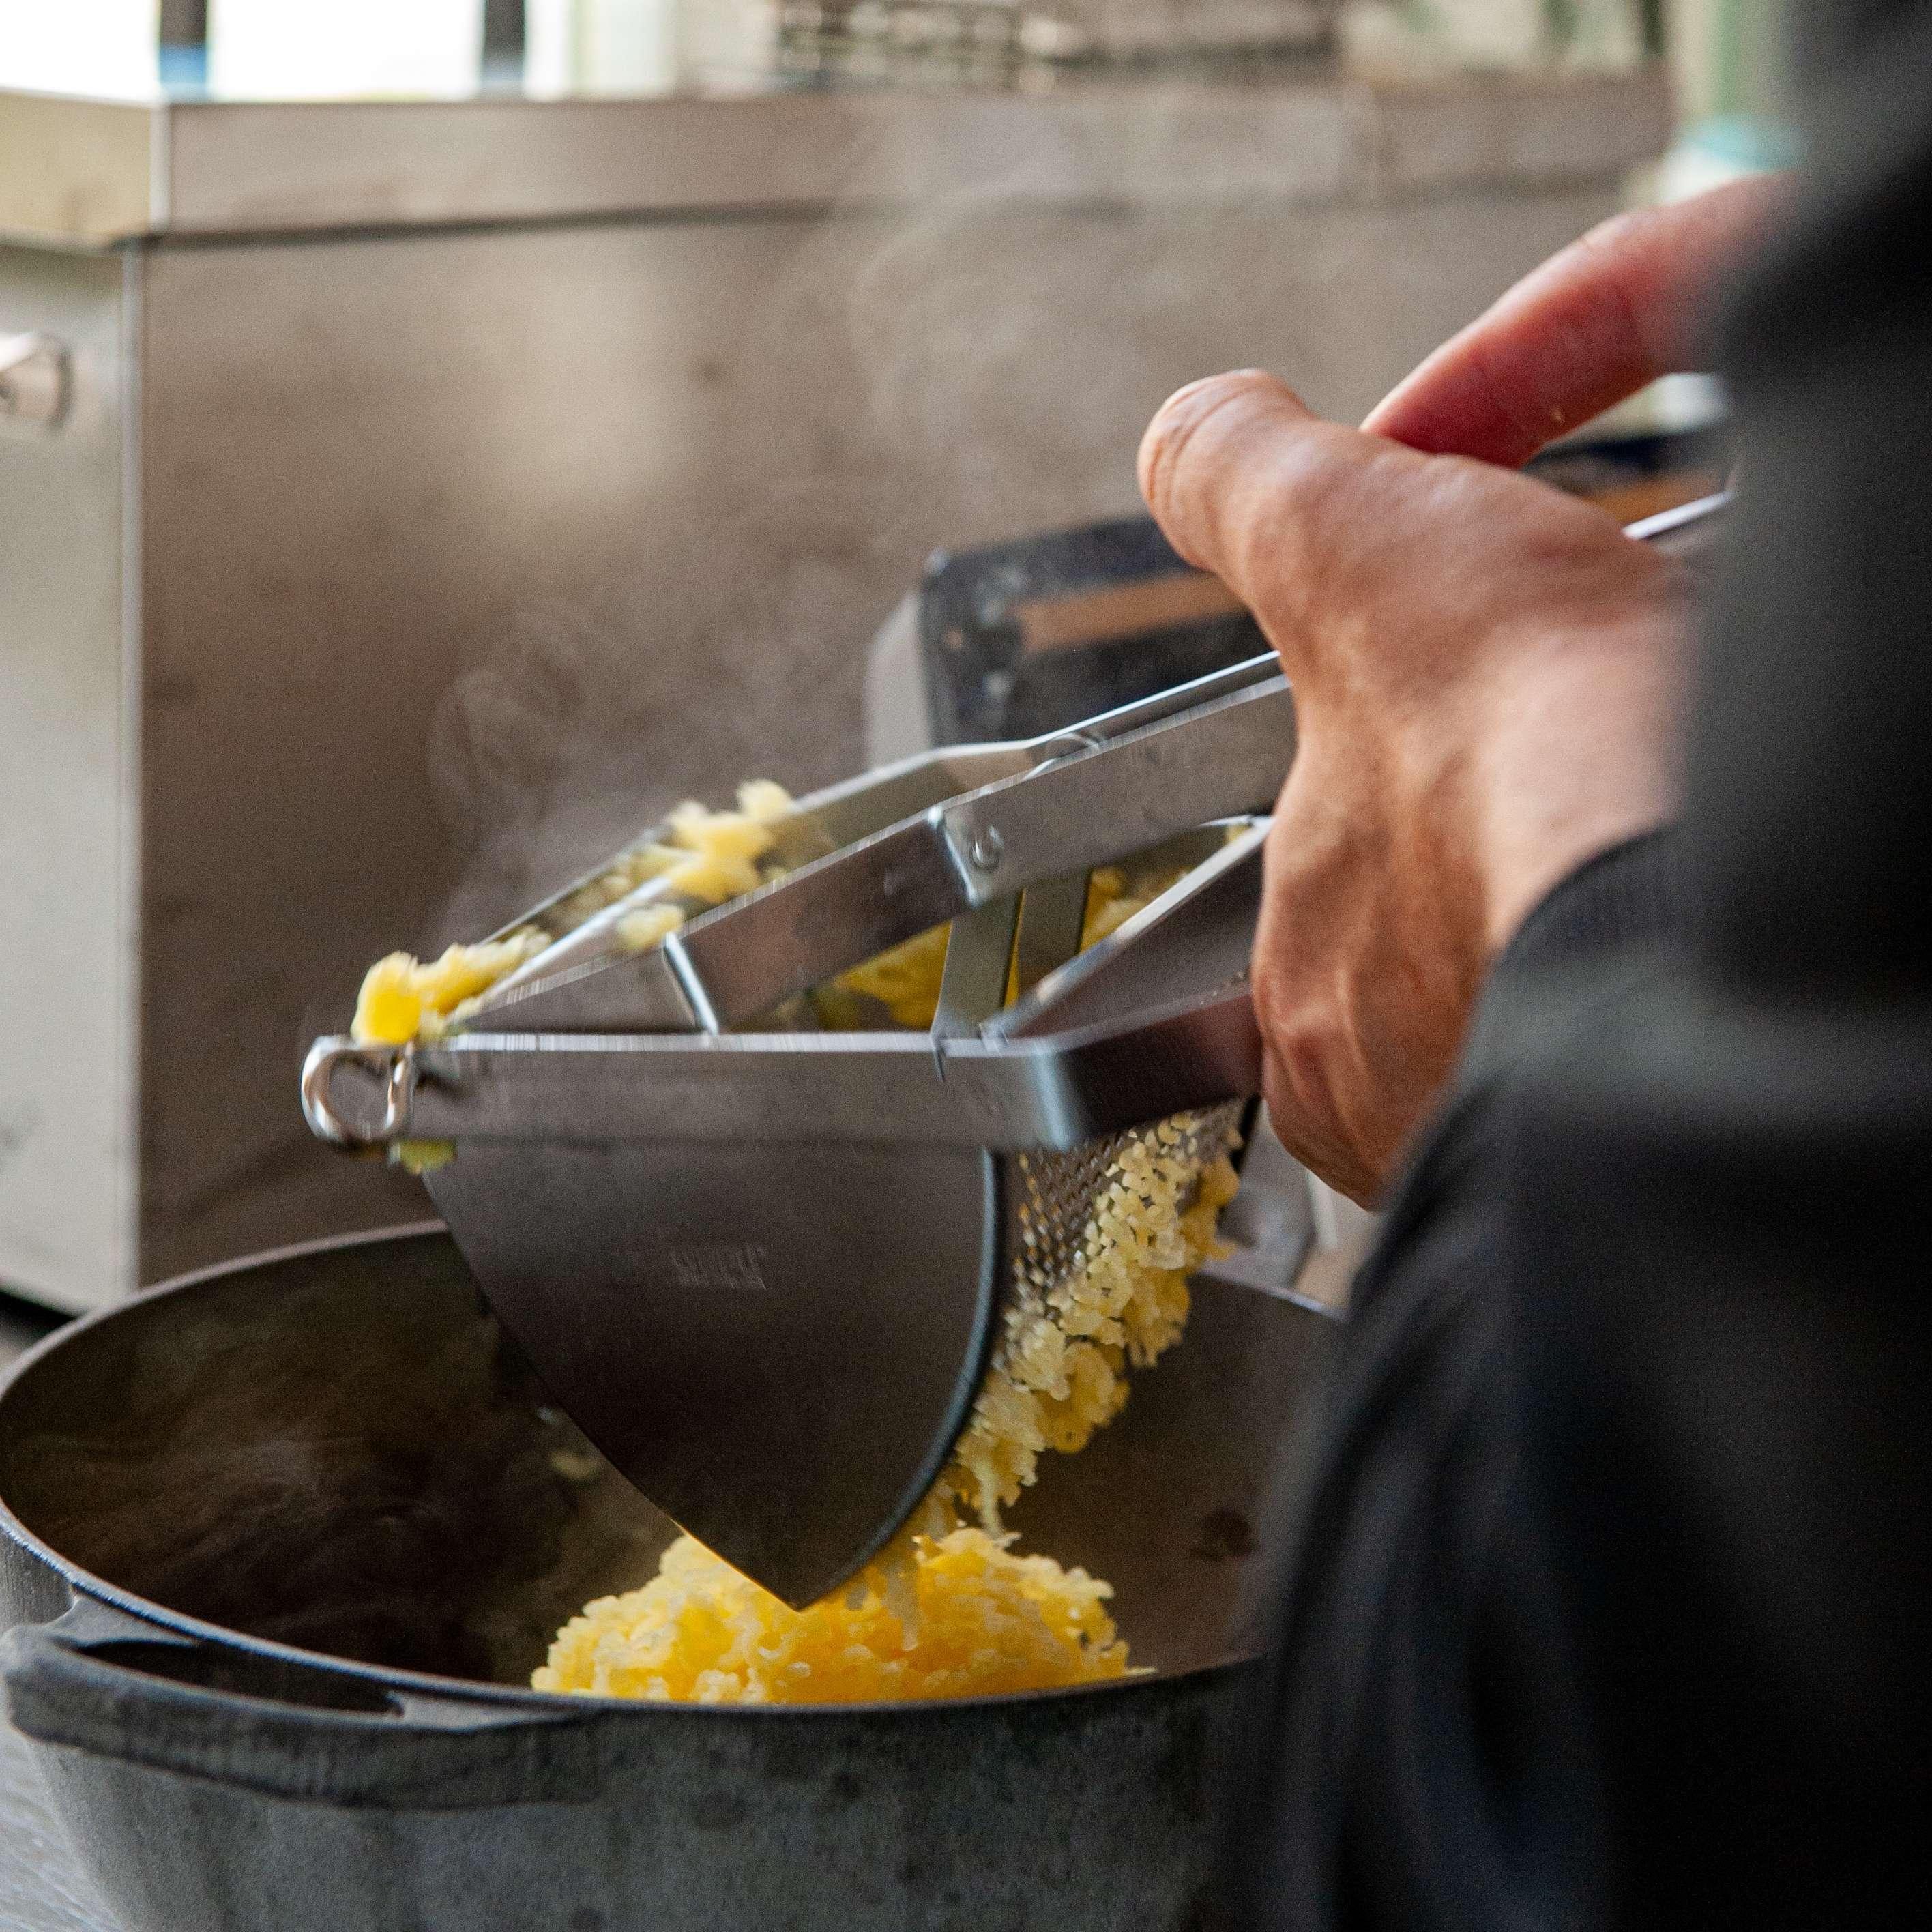 Kartoffelpüree sous-vide